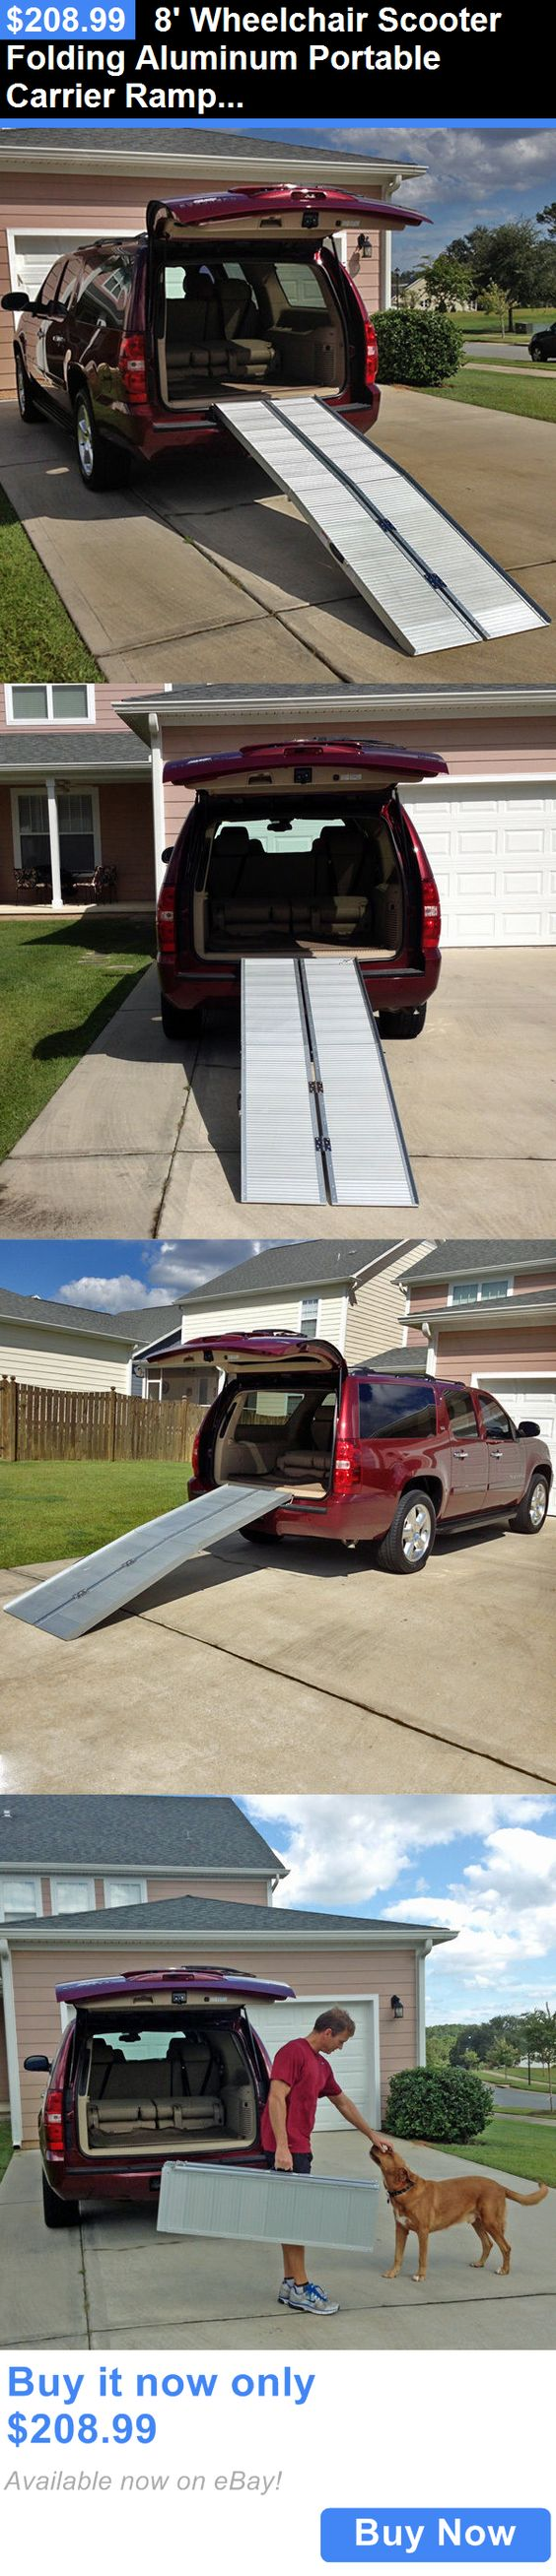 Access Ramps: 8 Wheelchair Scooter Folding Aluminum Portable Carrier Ramp: 7 9 Van Handicap BUY IT NOW ONLY: $208.99